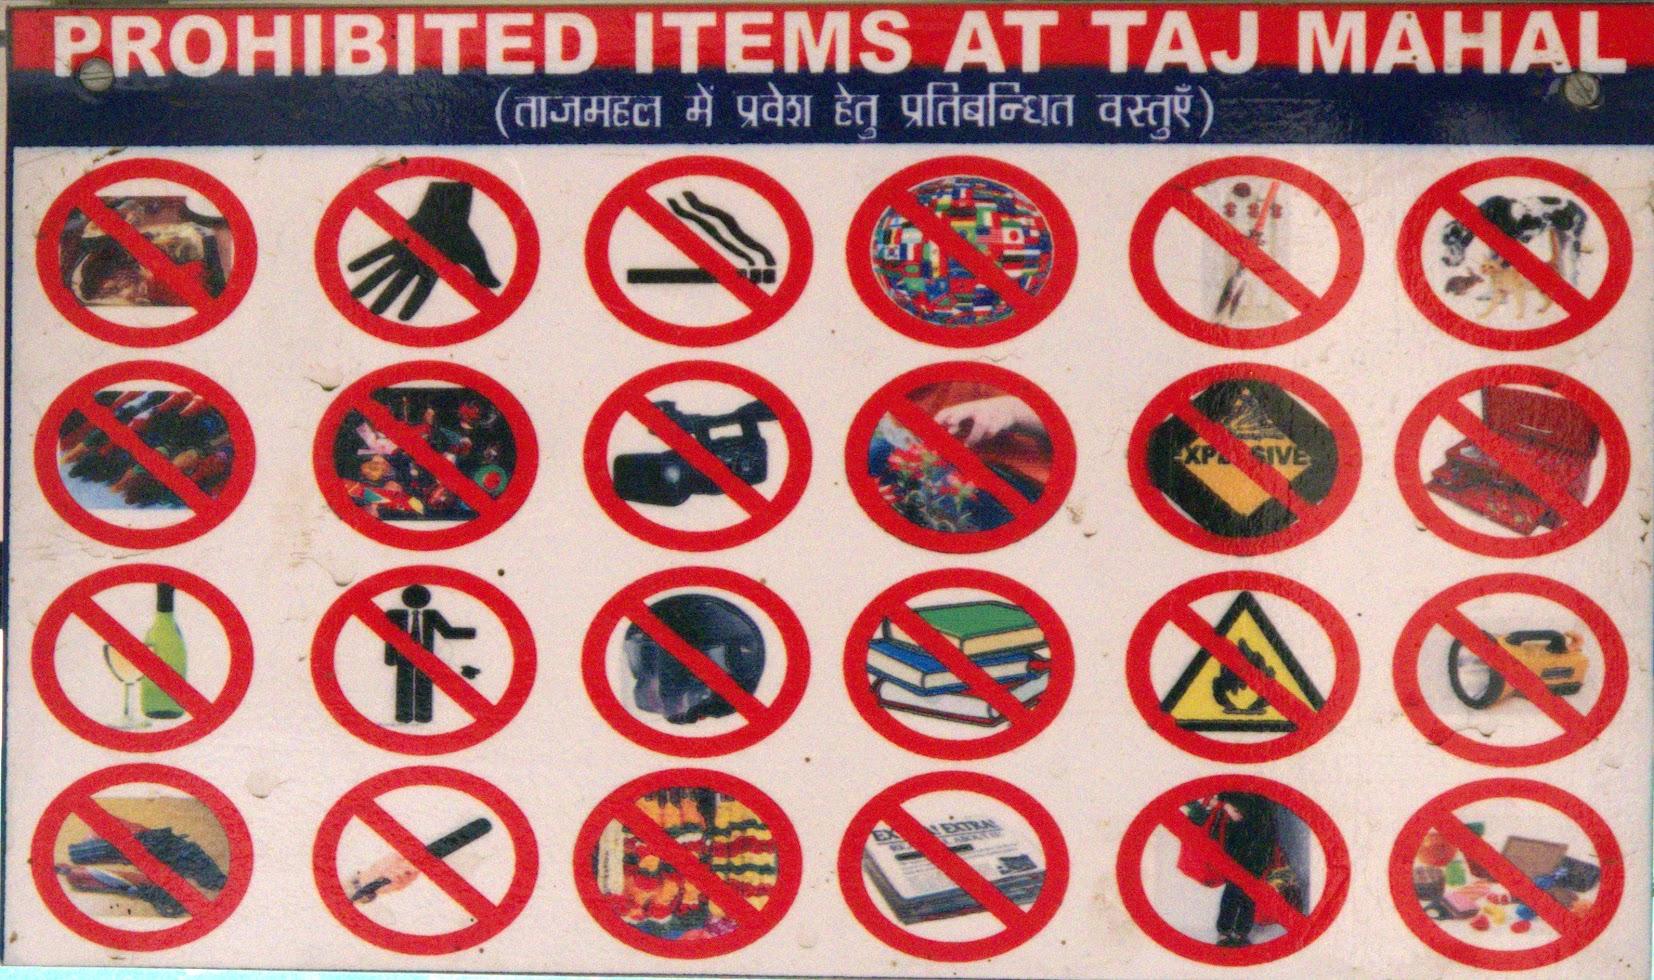 Prohibited items at Taj Mahal